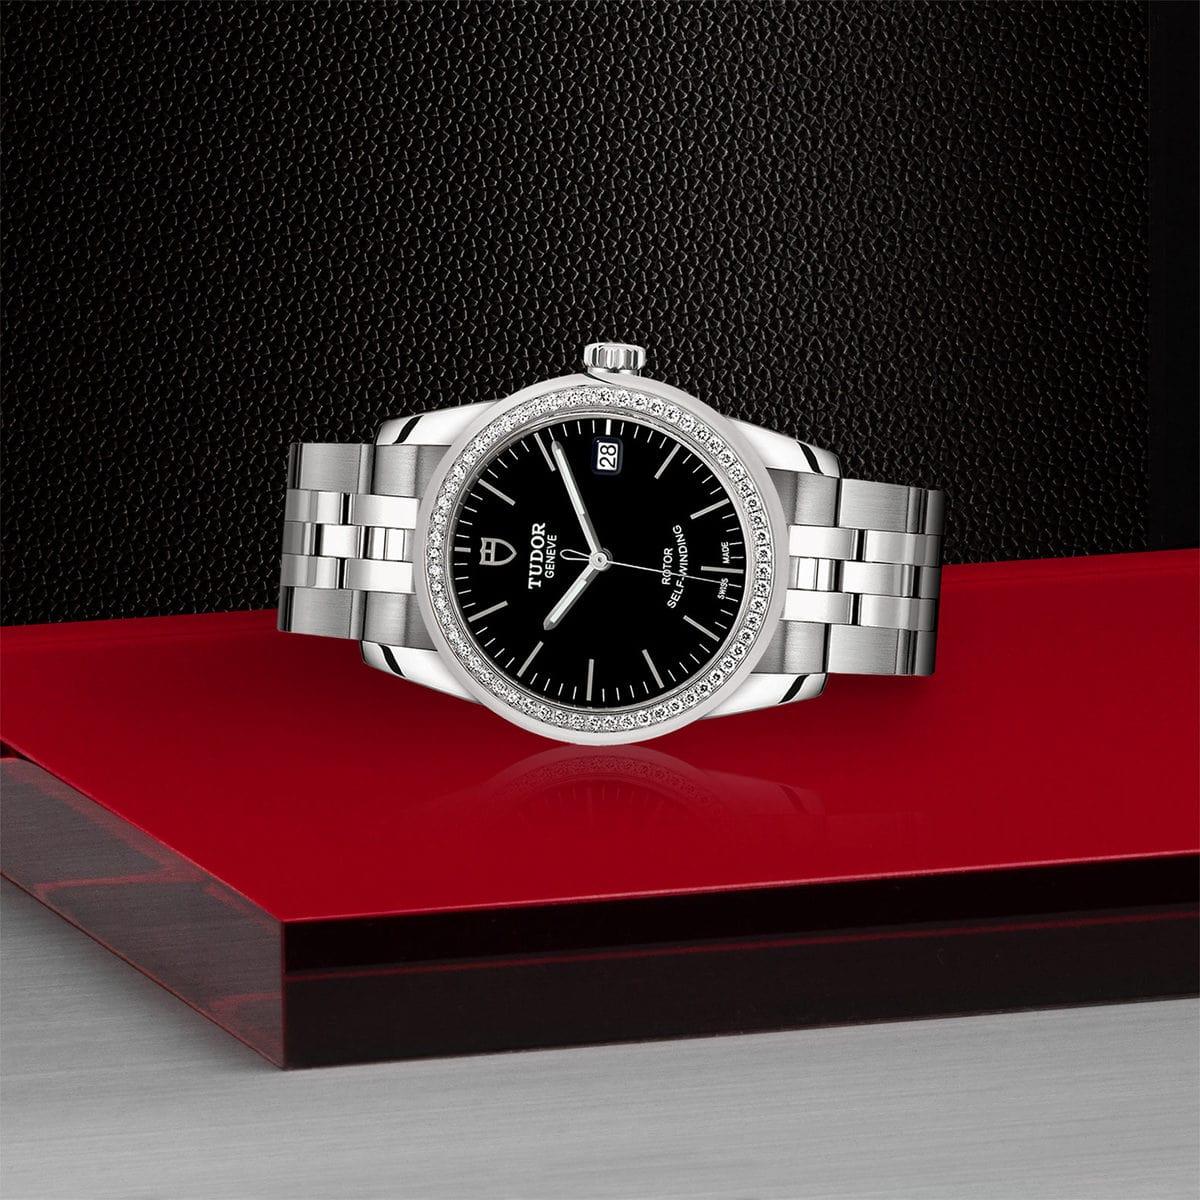 Tudor Glamour Date M55020-0008